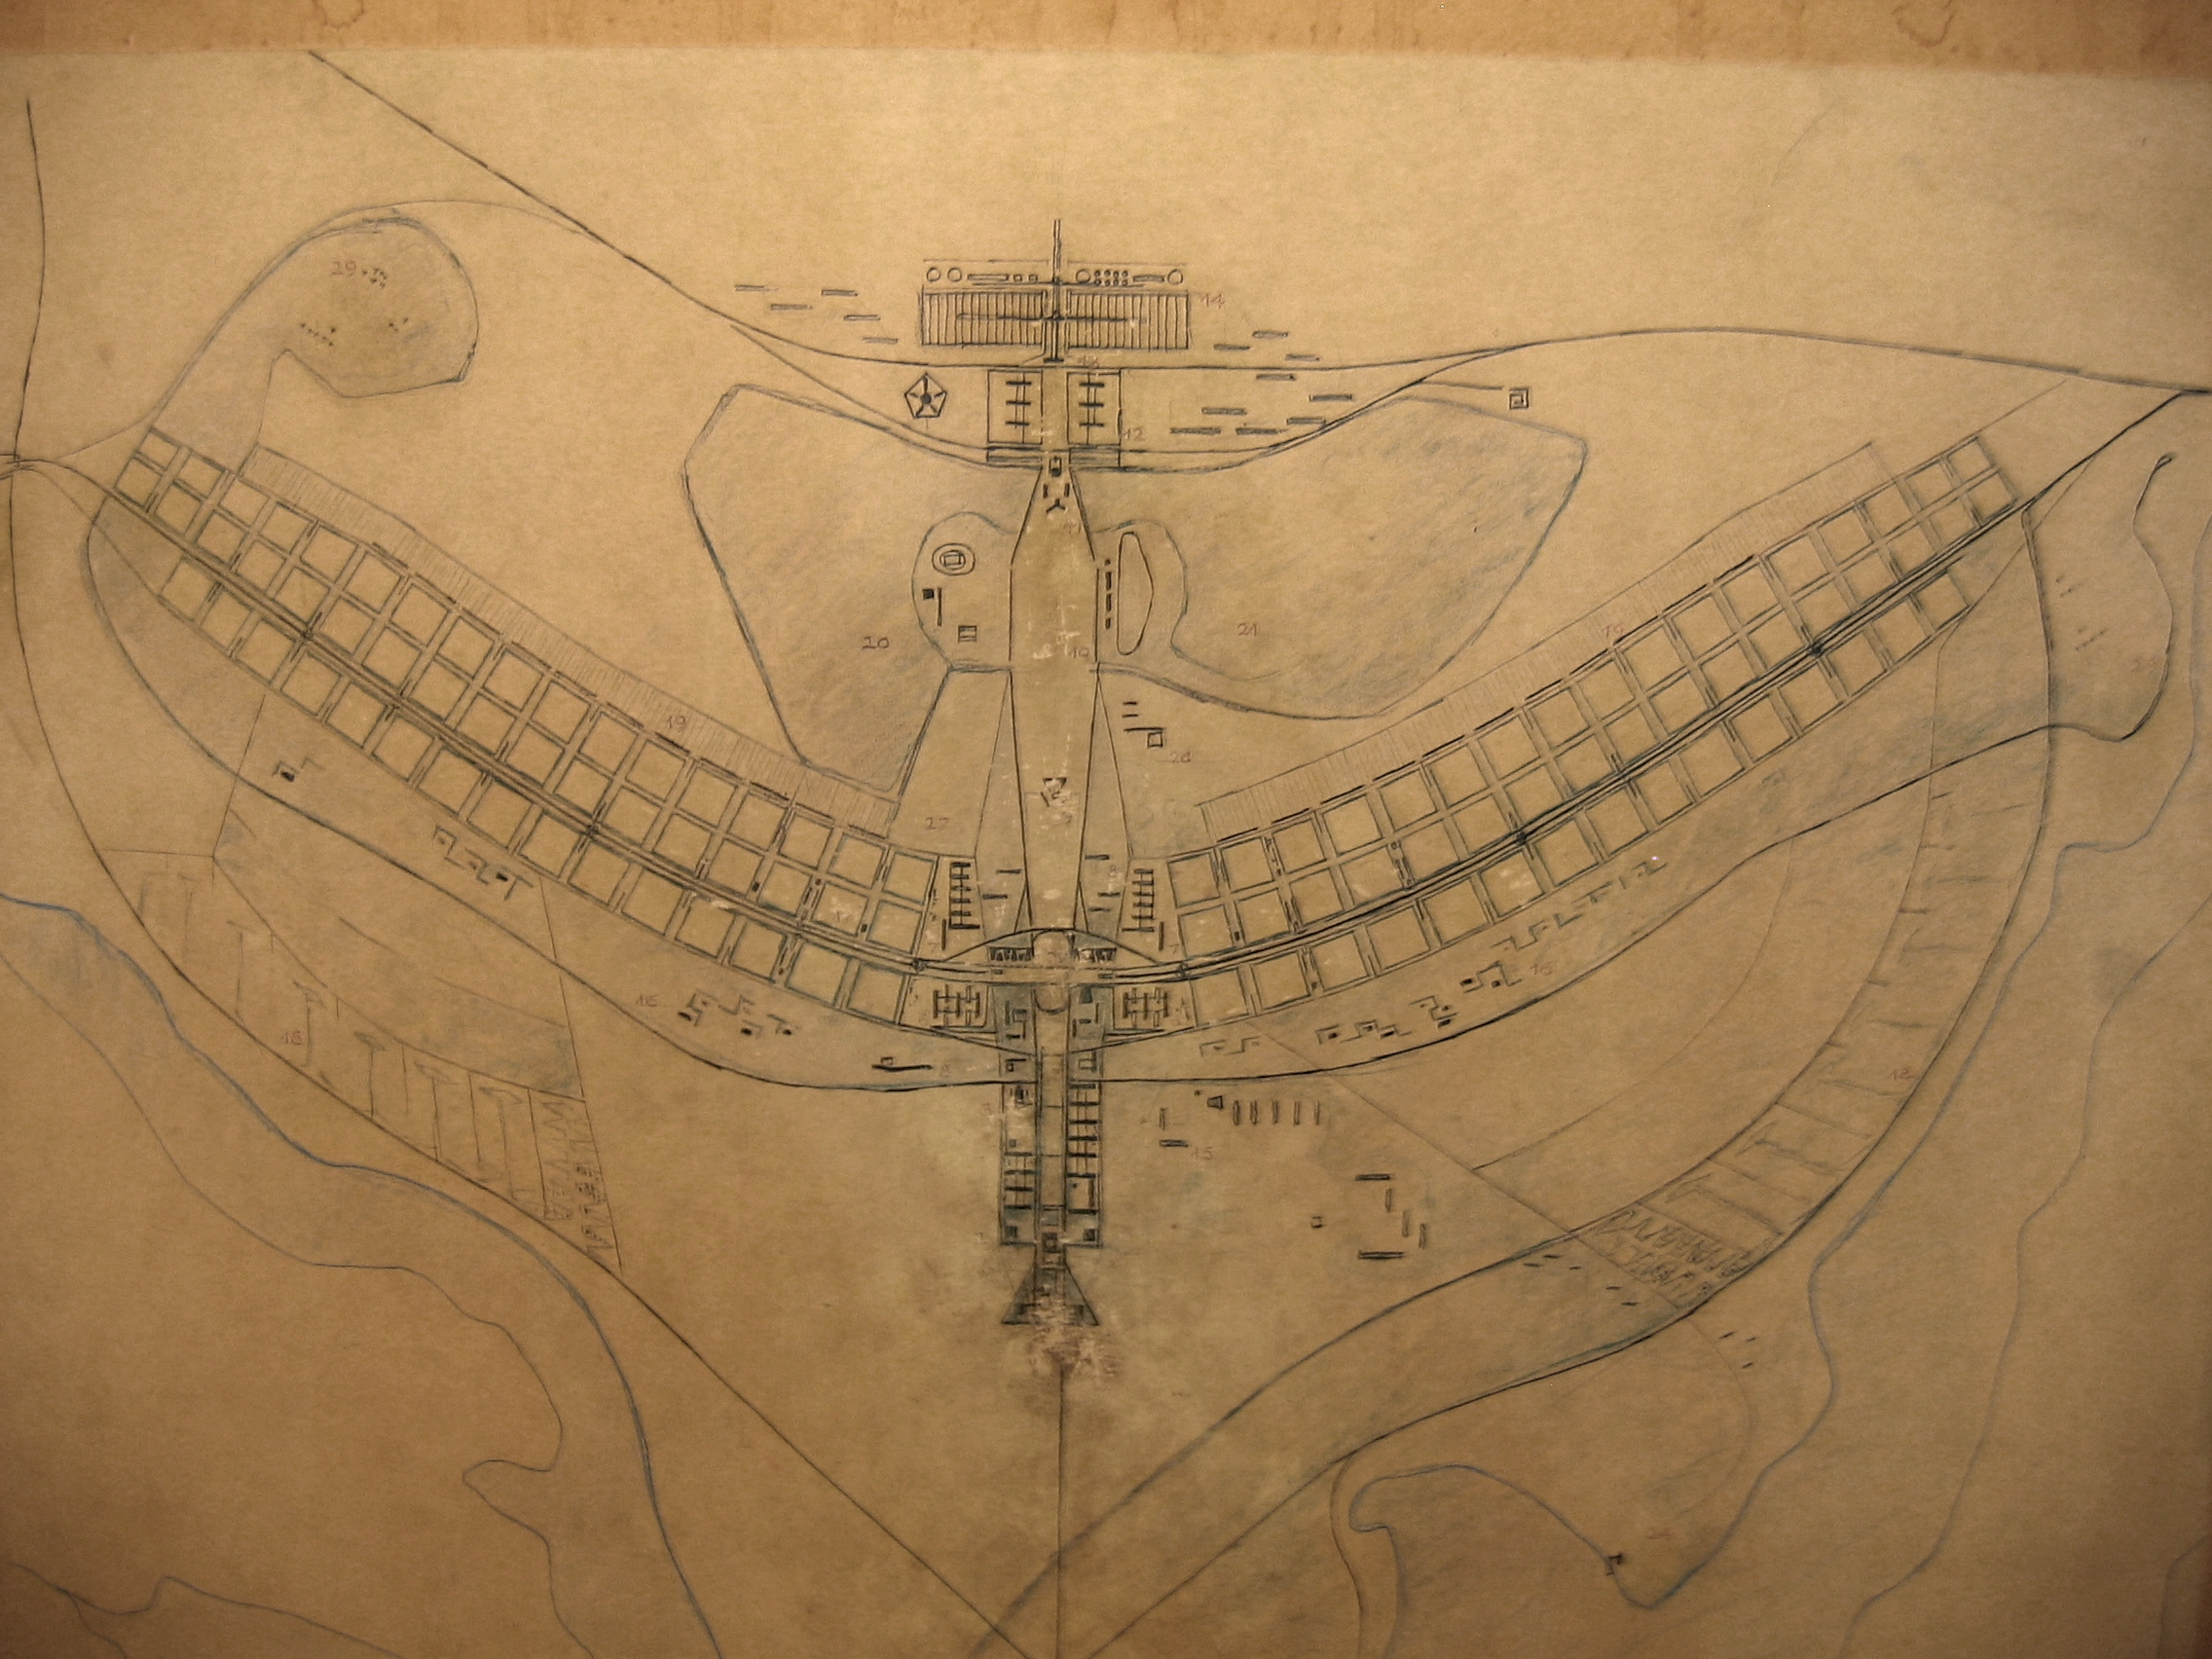 Brasilia arquitectura y construccion taringa for Arquitectura y construccion